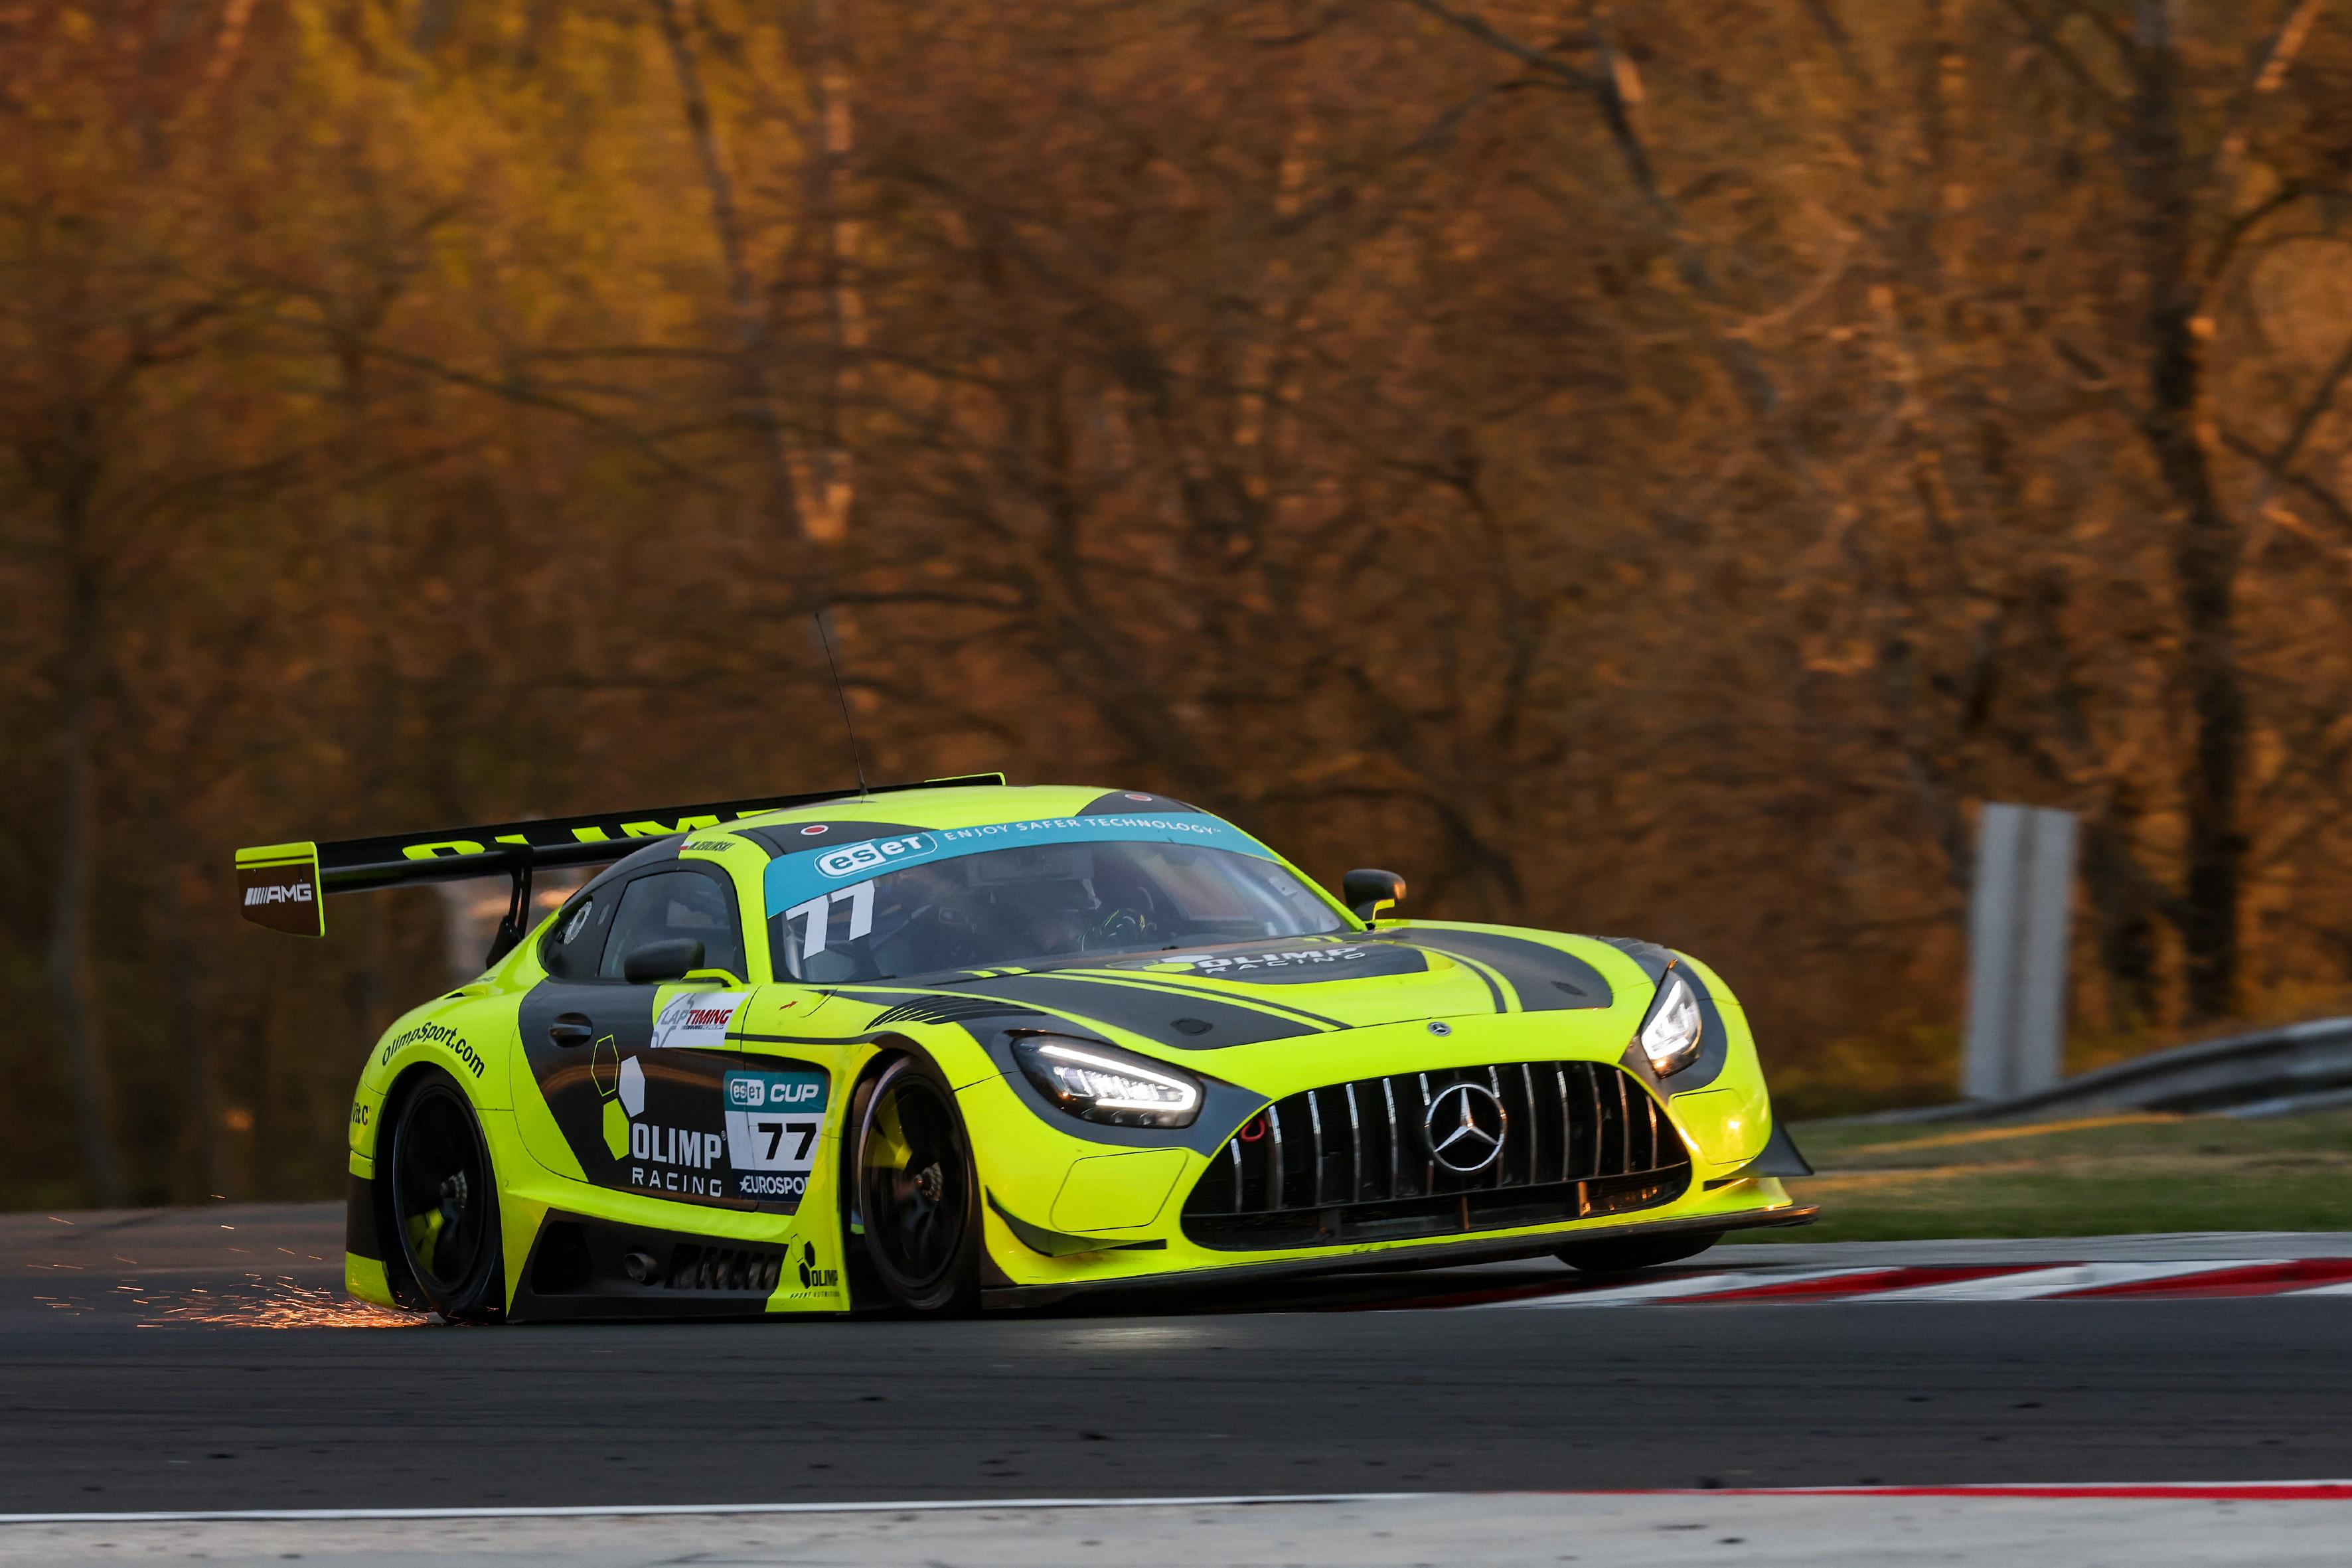 Jedlinski wins the final GT3 Endurance, Zsigo becomes champion